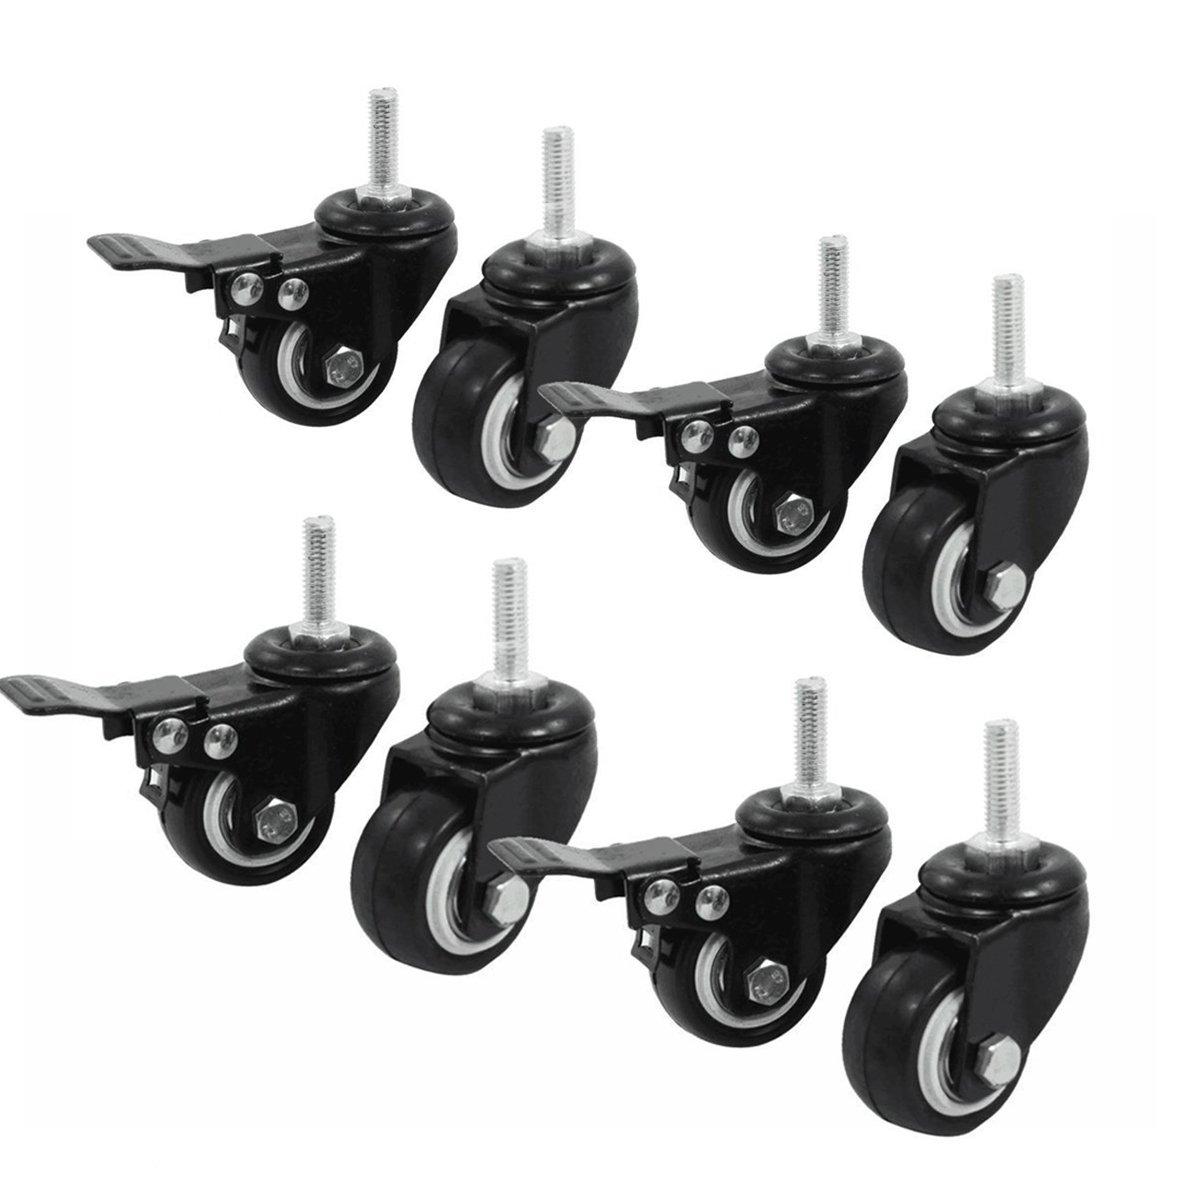 Set of 4 Casters,Saim Shopping Cart Wheel Trolley Brake Swivel Caster M8 1.5 Wheel Dia